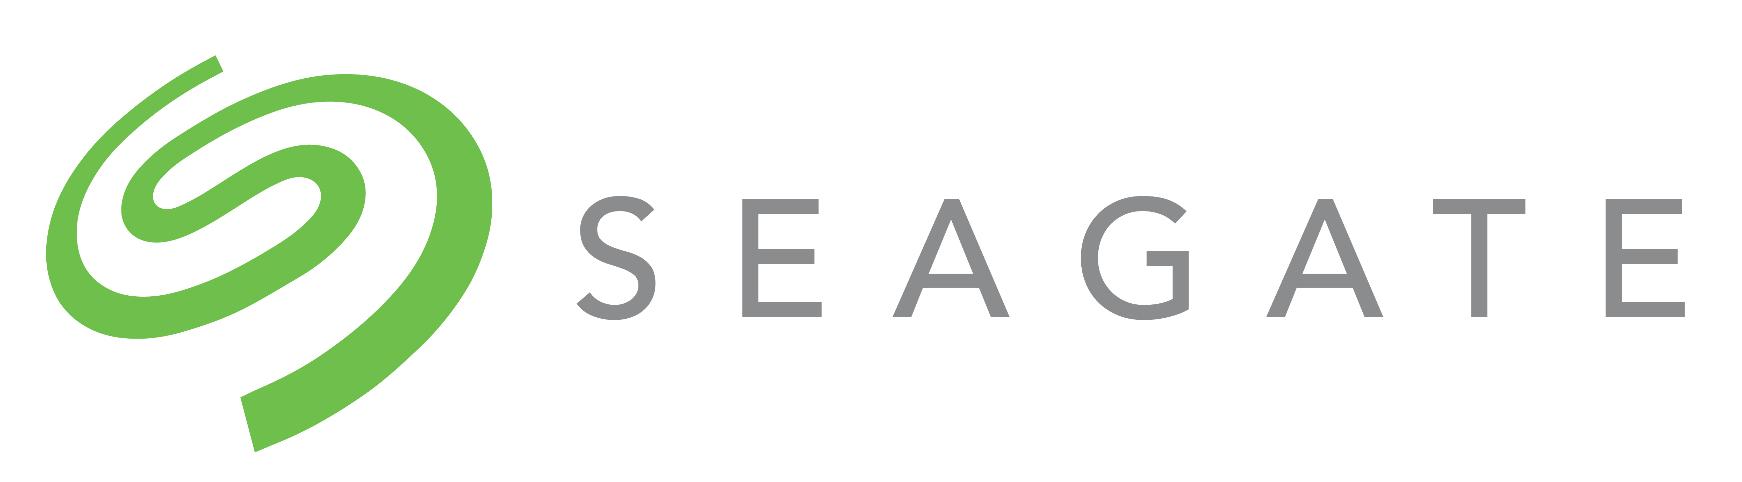 Seagate Ironwolf 125 SSD 500GB Sata 6 Gb/s Retai